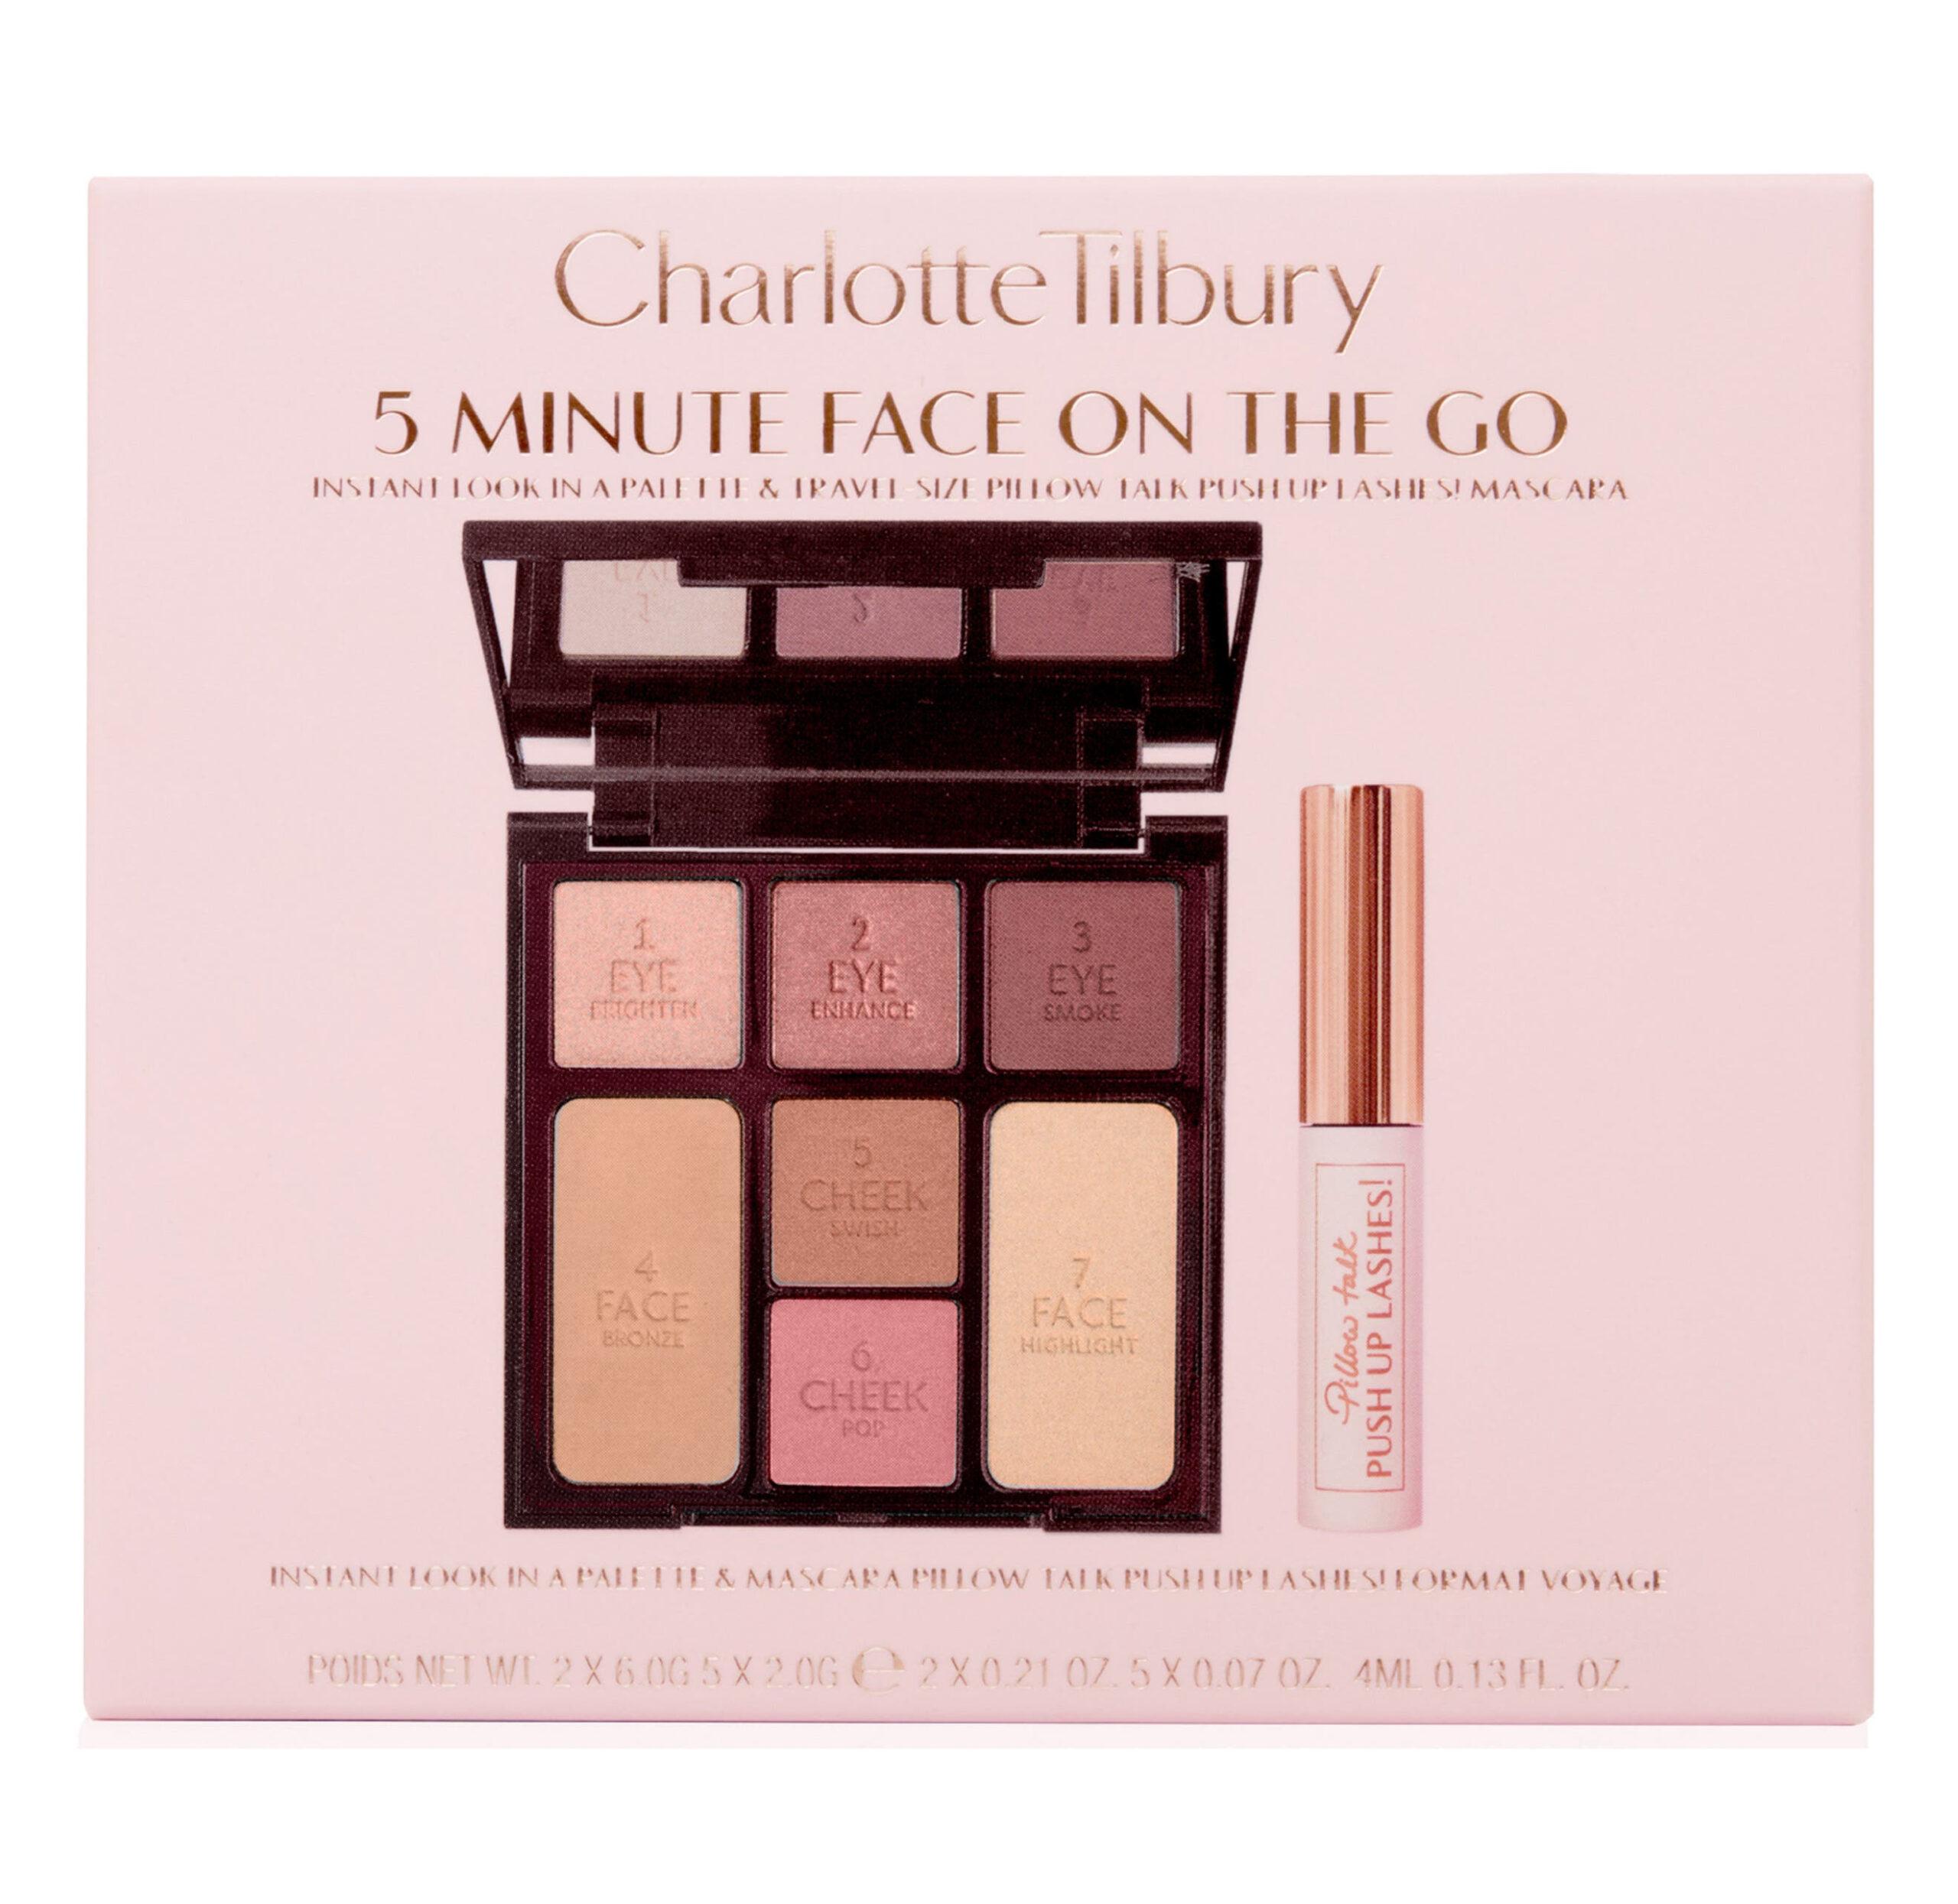 Charlotte Tilbury Sunset Dreamscape Instant Look in a Palette Set